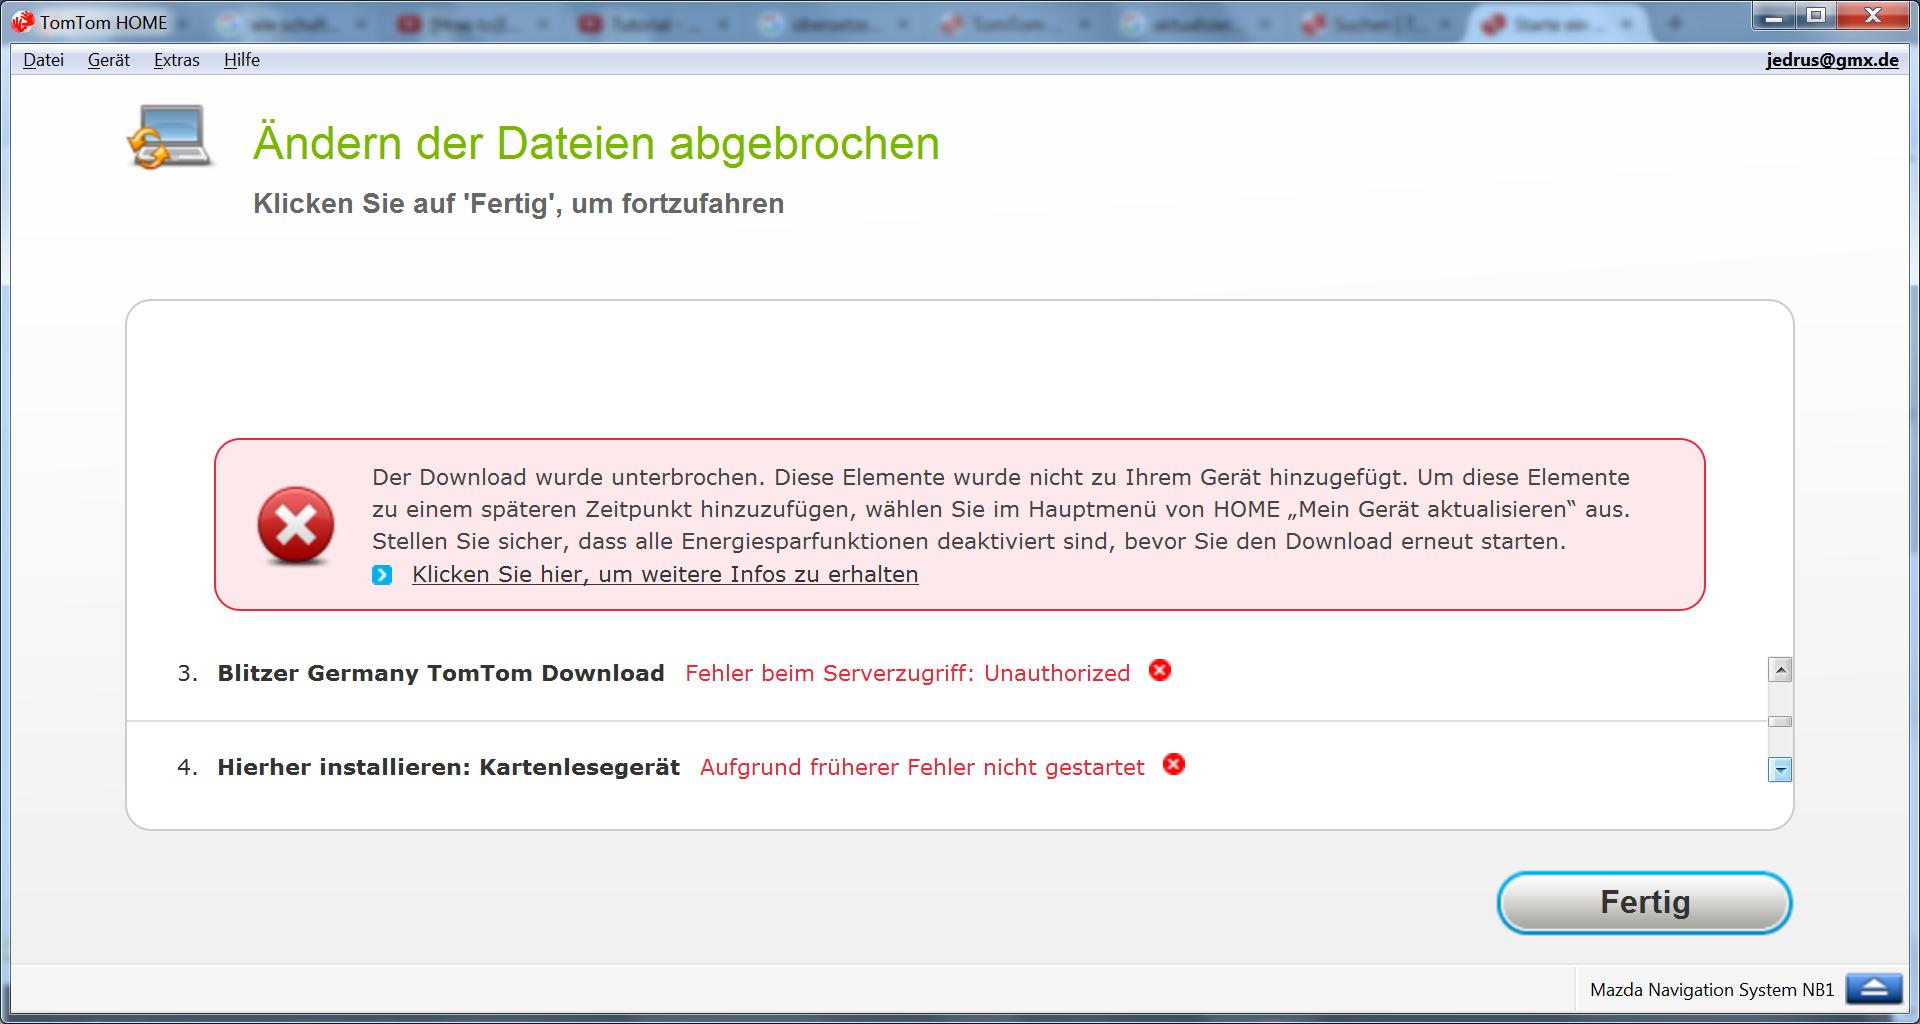 Fehler beim Serverzugriff : Unauthorized | TomTom Forum and Community